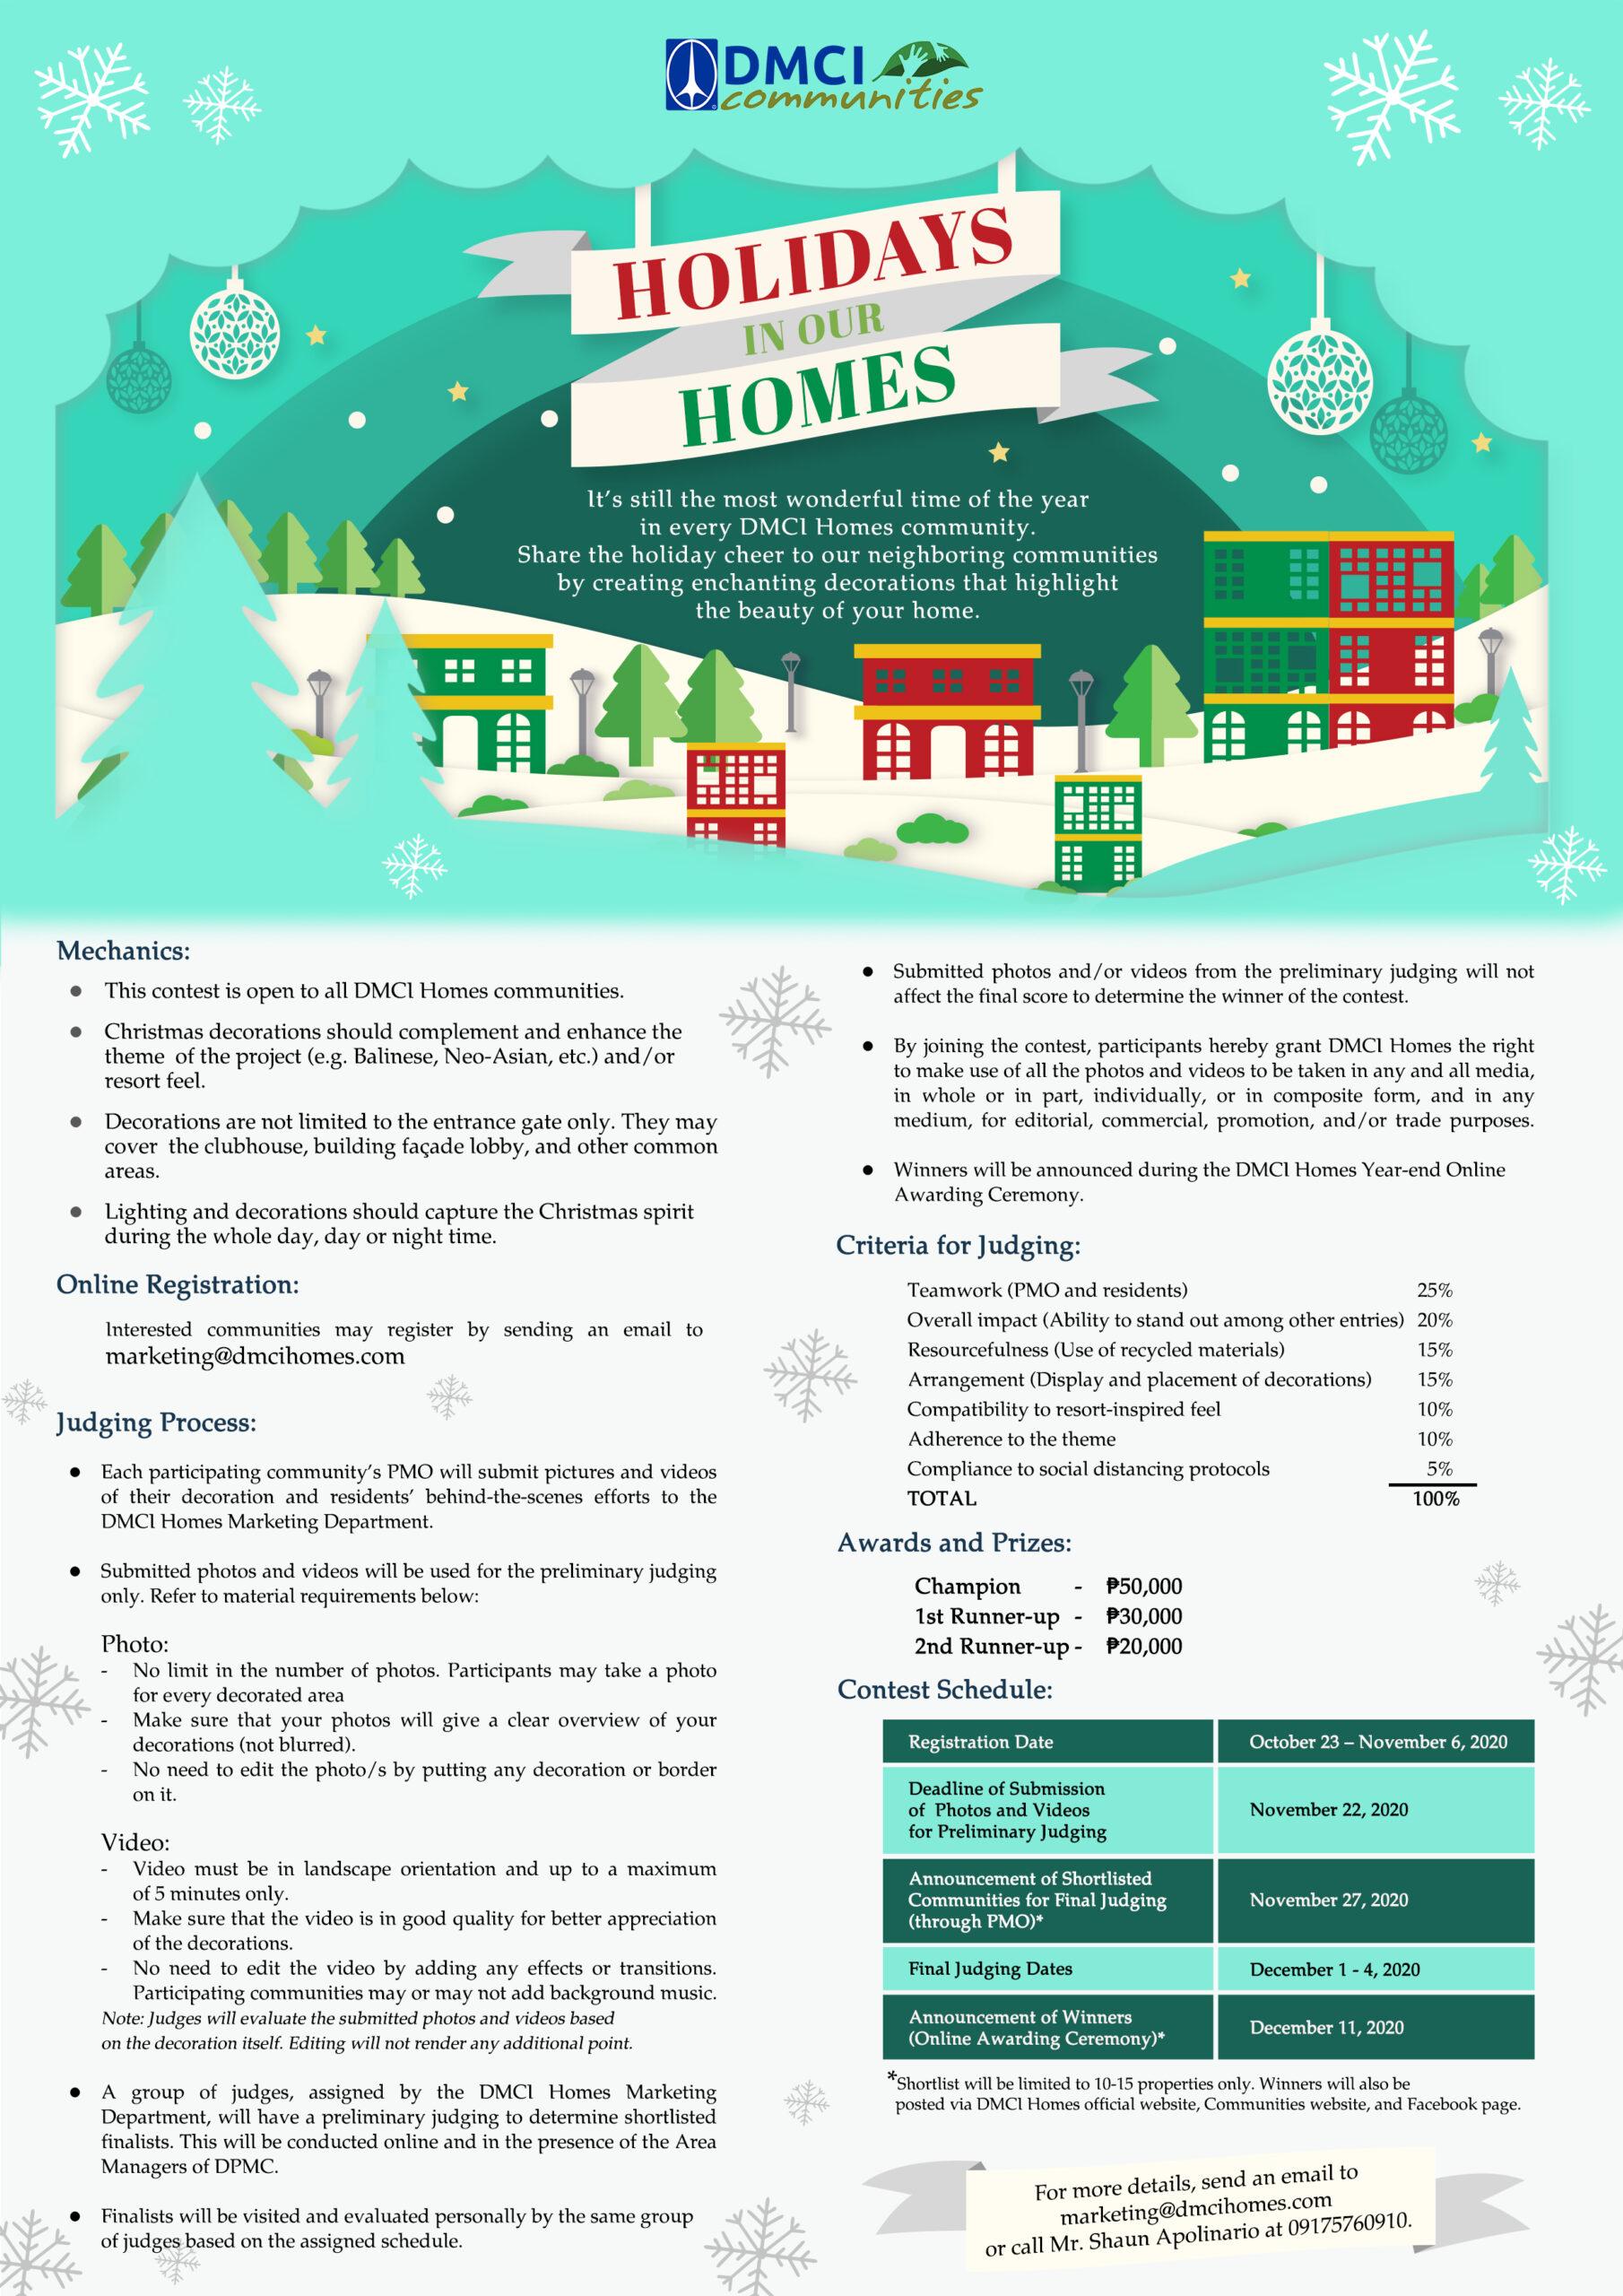 dmci-communities-holiday-decor